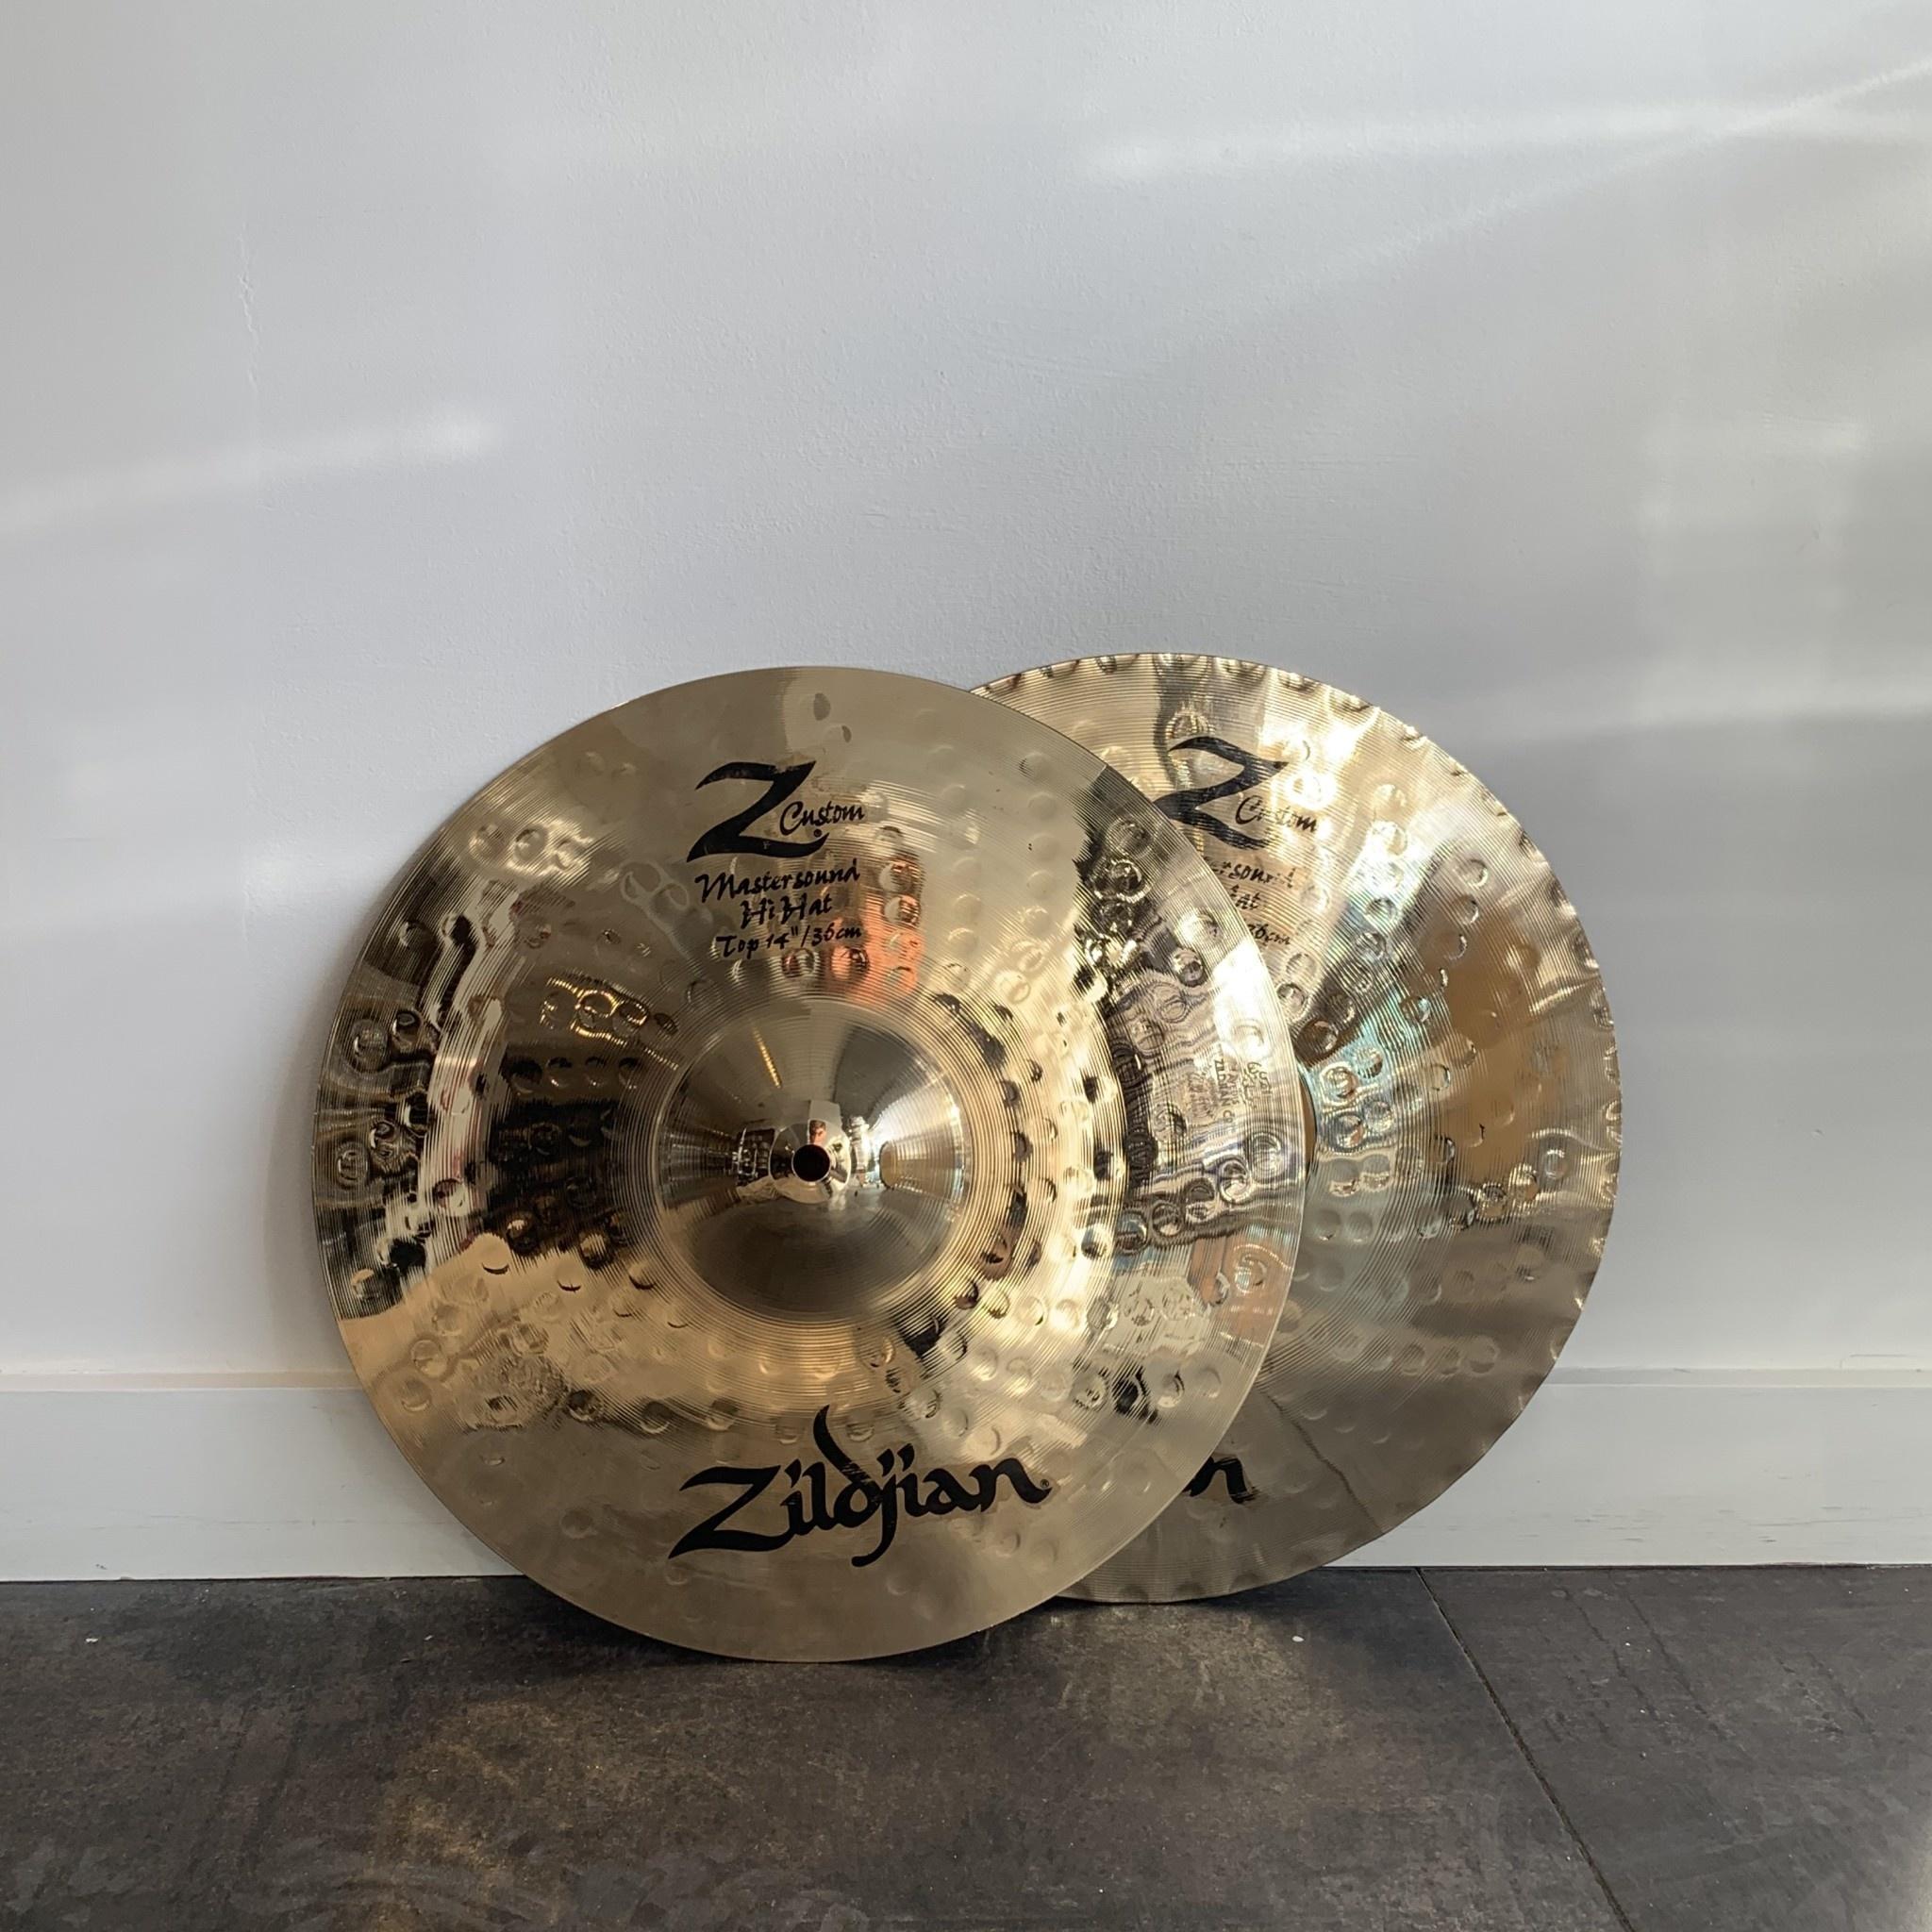 Zildjian Used Zildjian Z Custom Mastersound Hi-hat Cymbals 14in